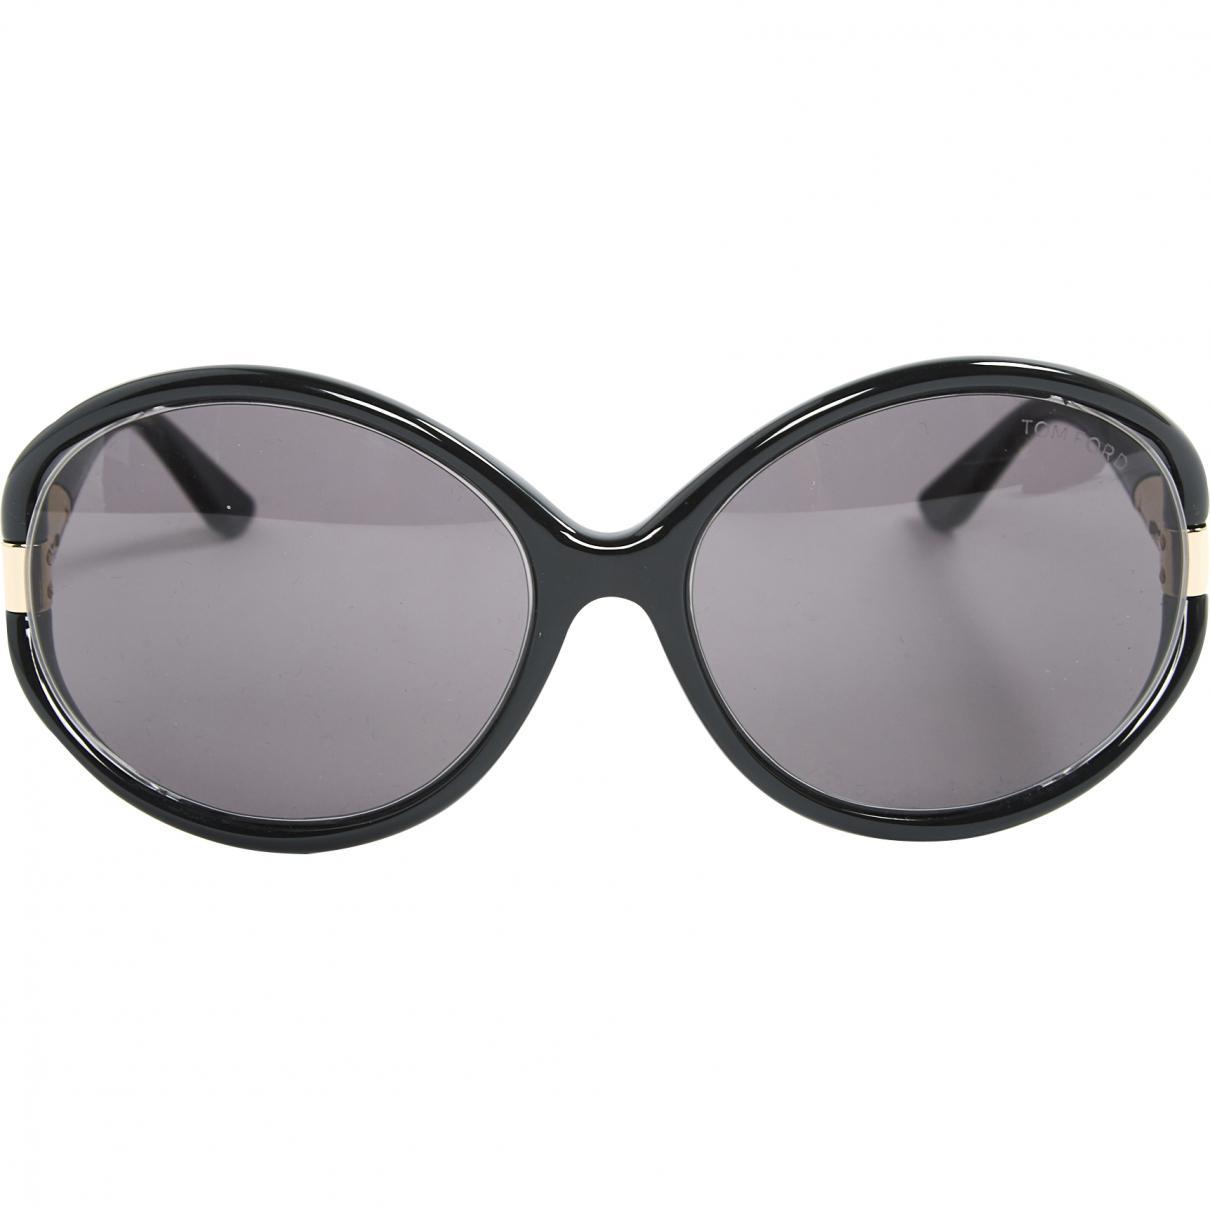 eb5902f50b9 Lyst - Tom Ford Oversized Sunglasses in Black